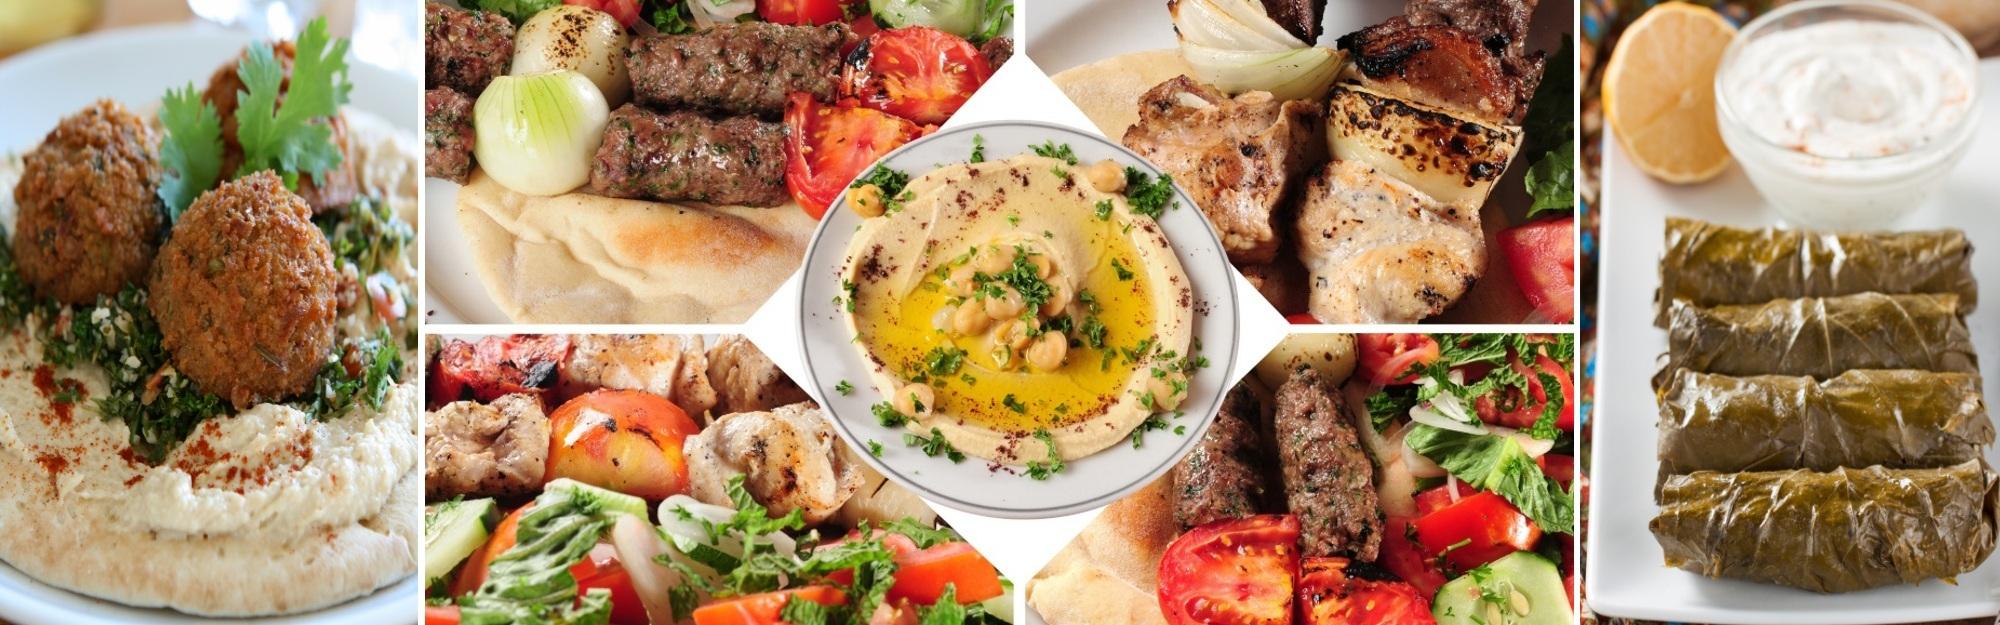 Abu Dhabi Food Festival Street Feast